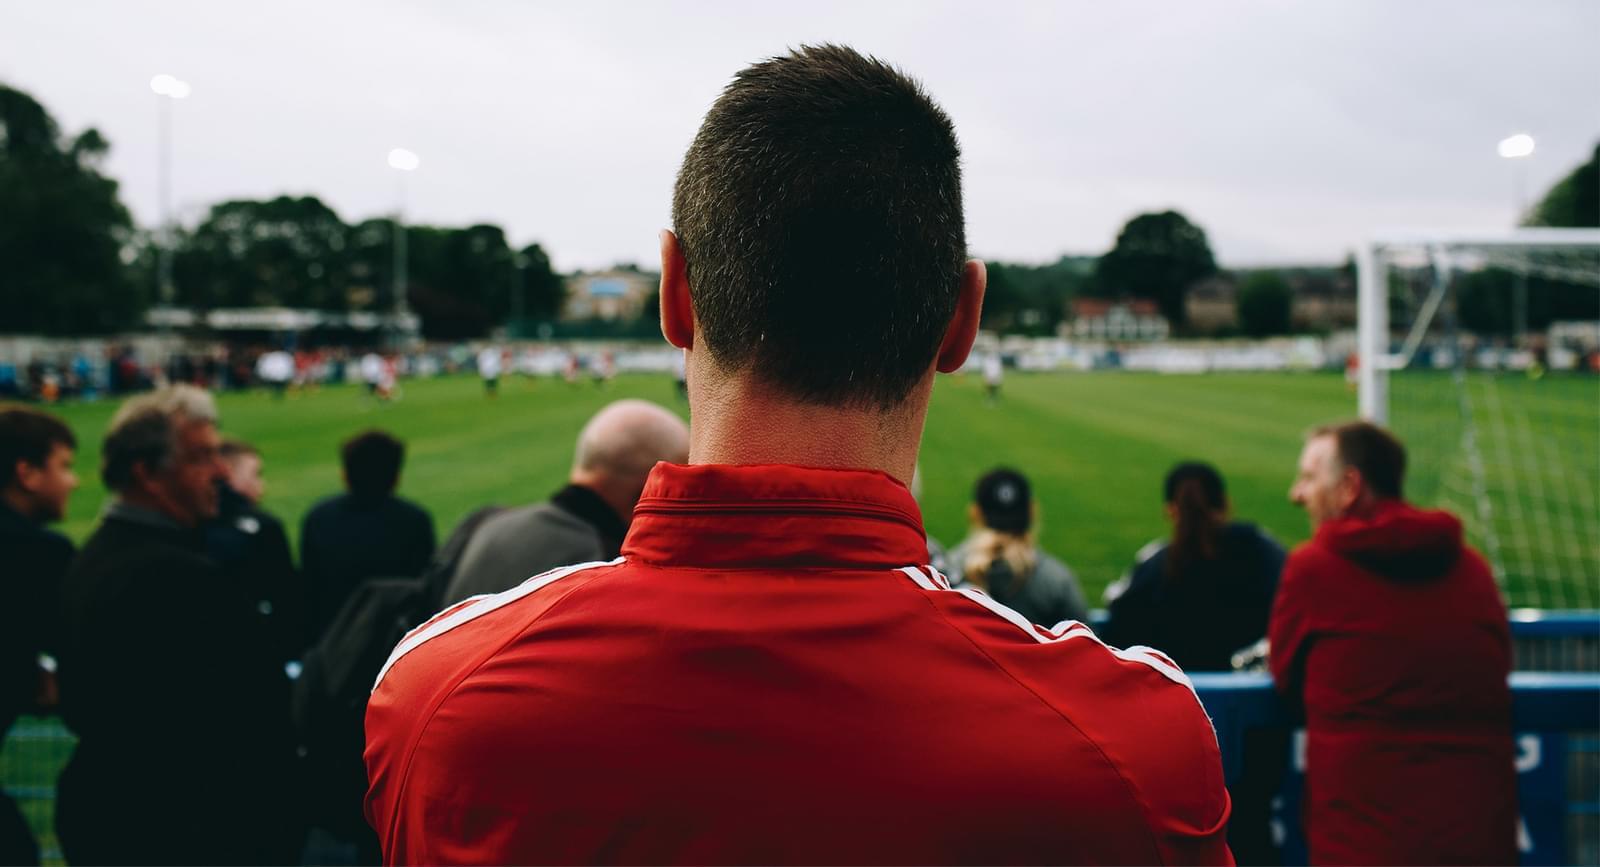 Fan watching a football game.